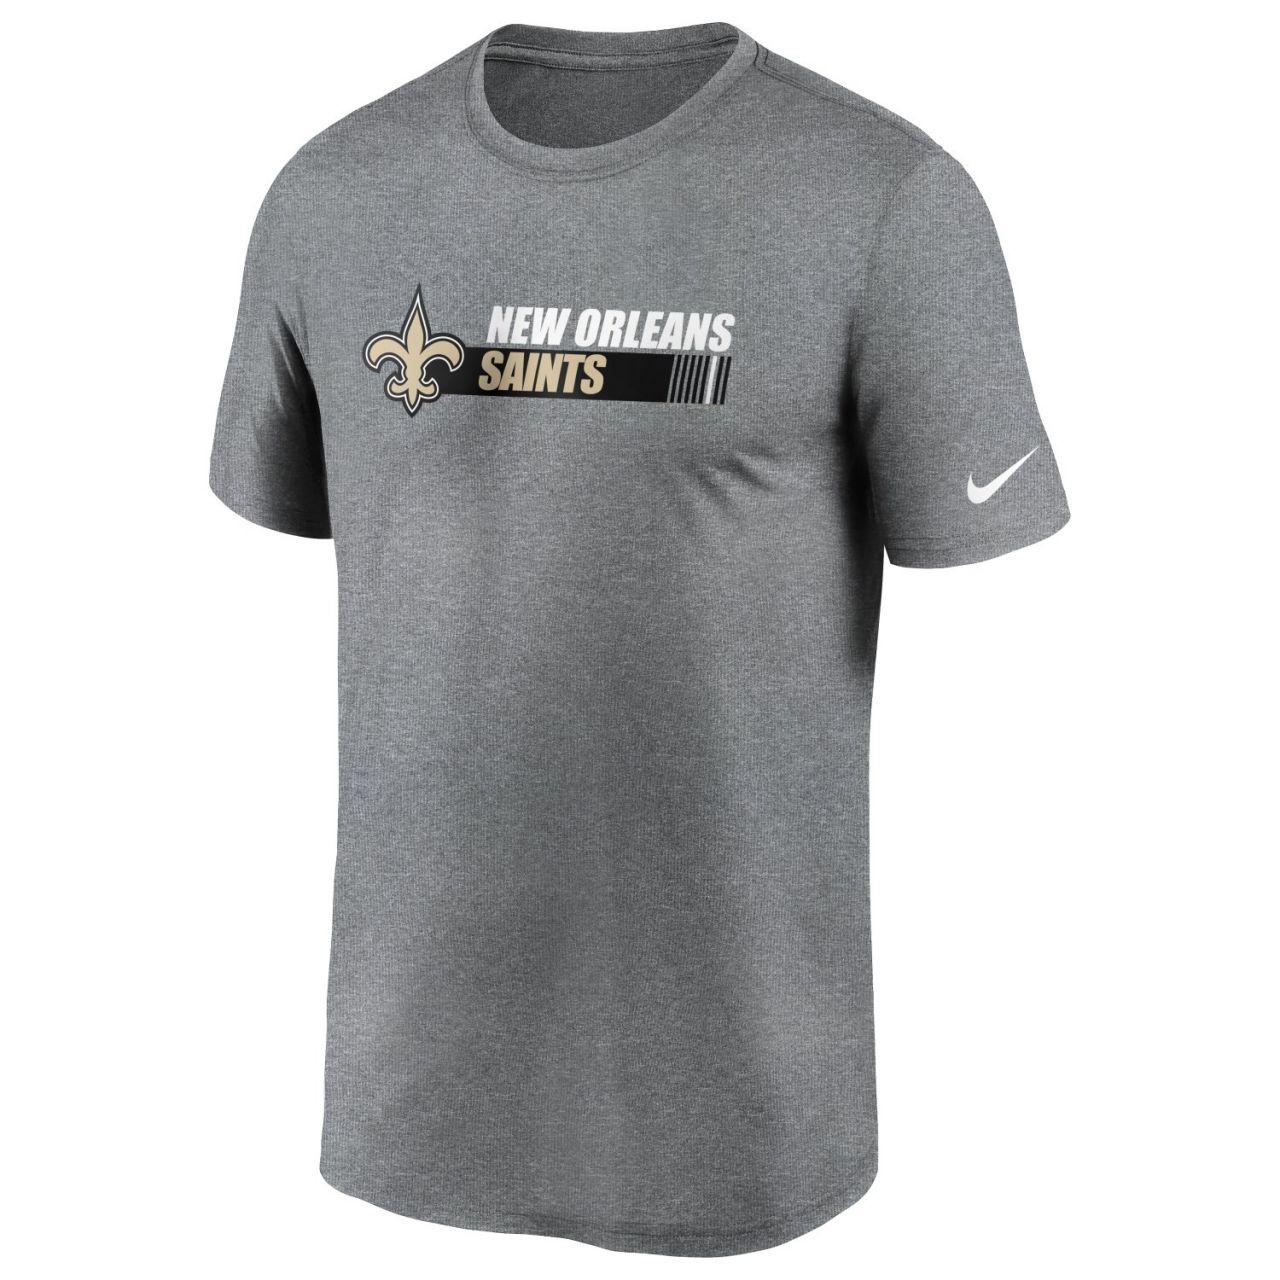 amfoo - Nike Dri-FIT Legend Shirt - PRIMETIME New Orleans Saints